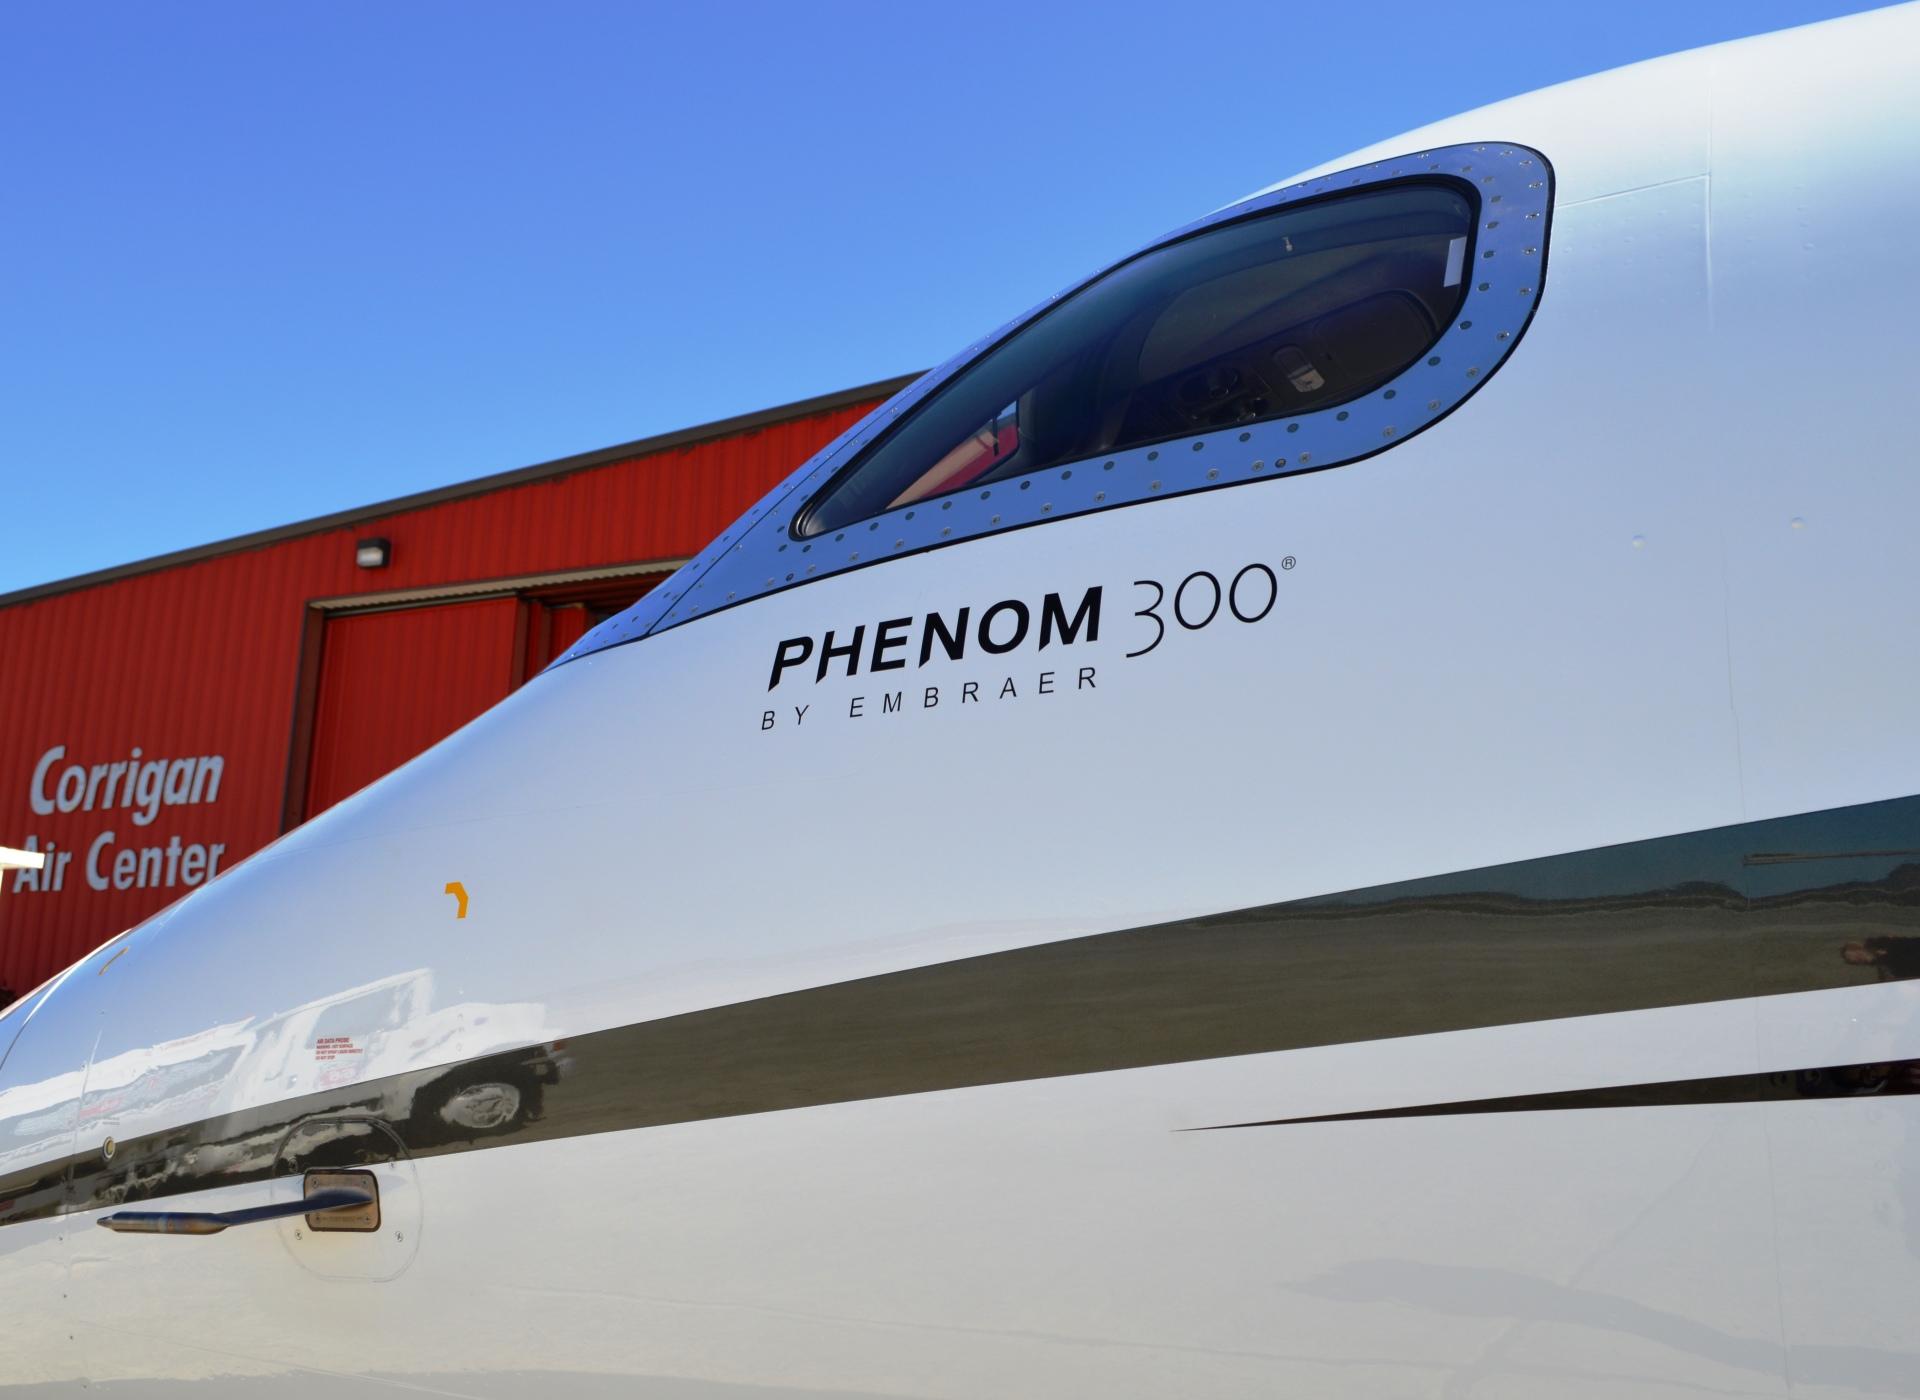 Phenom 300